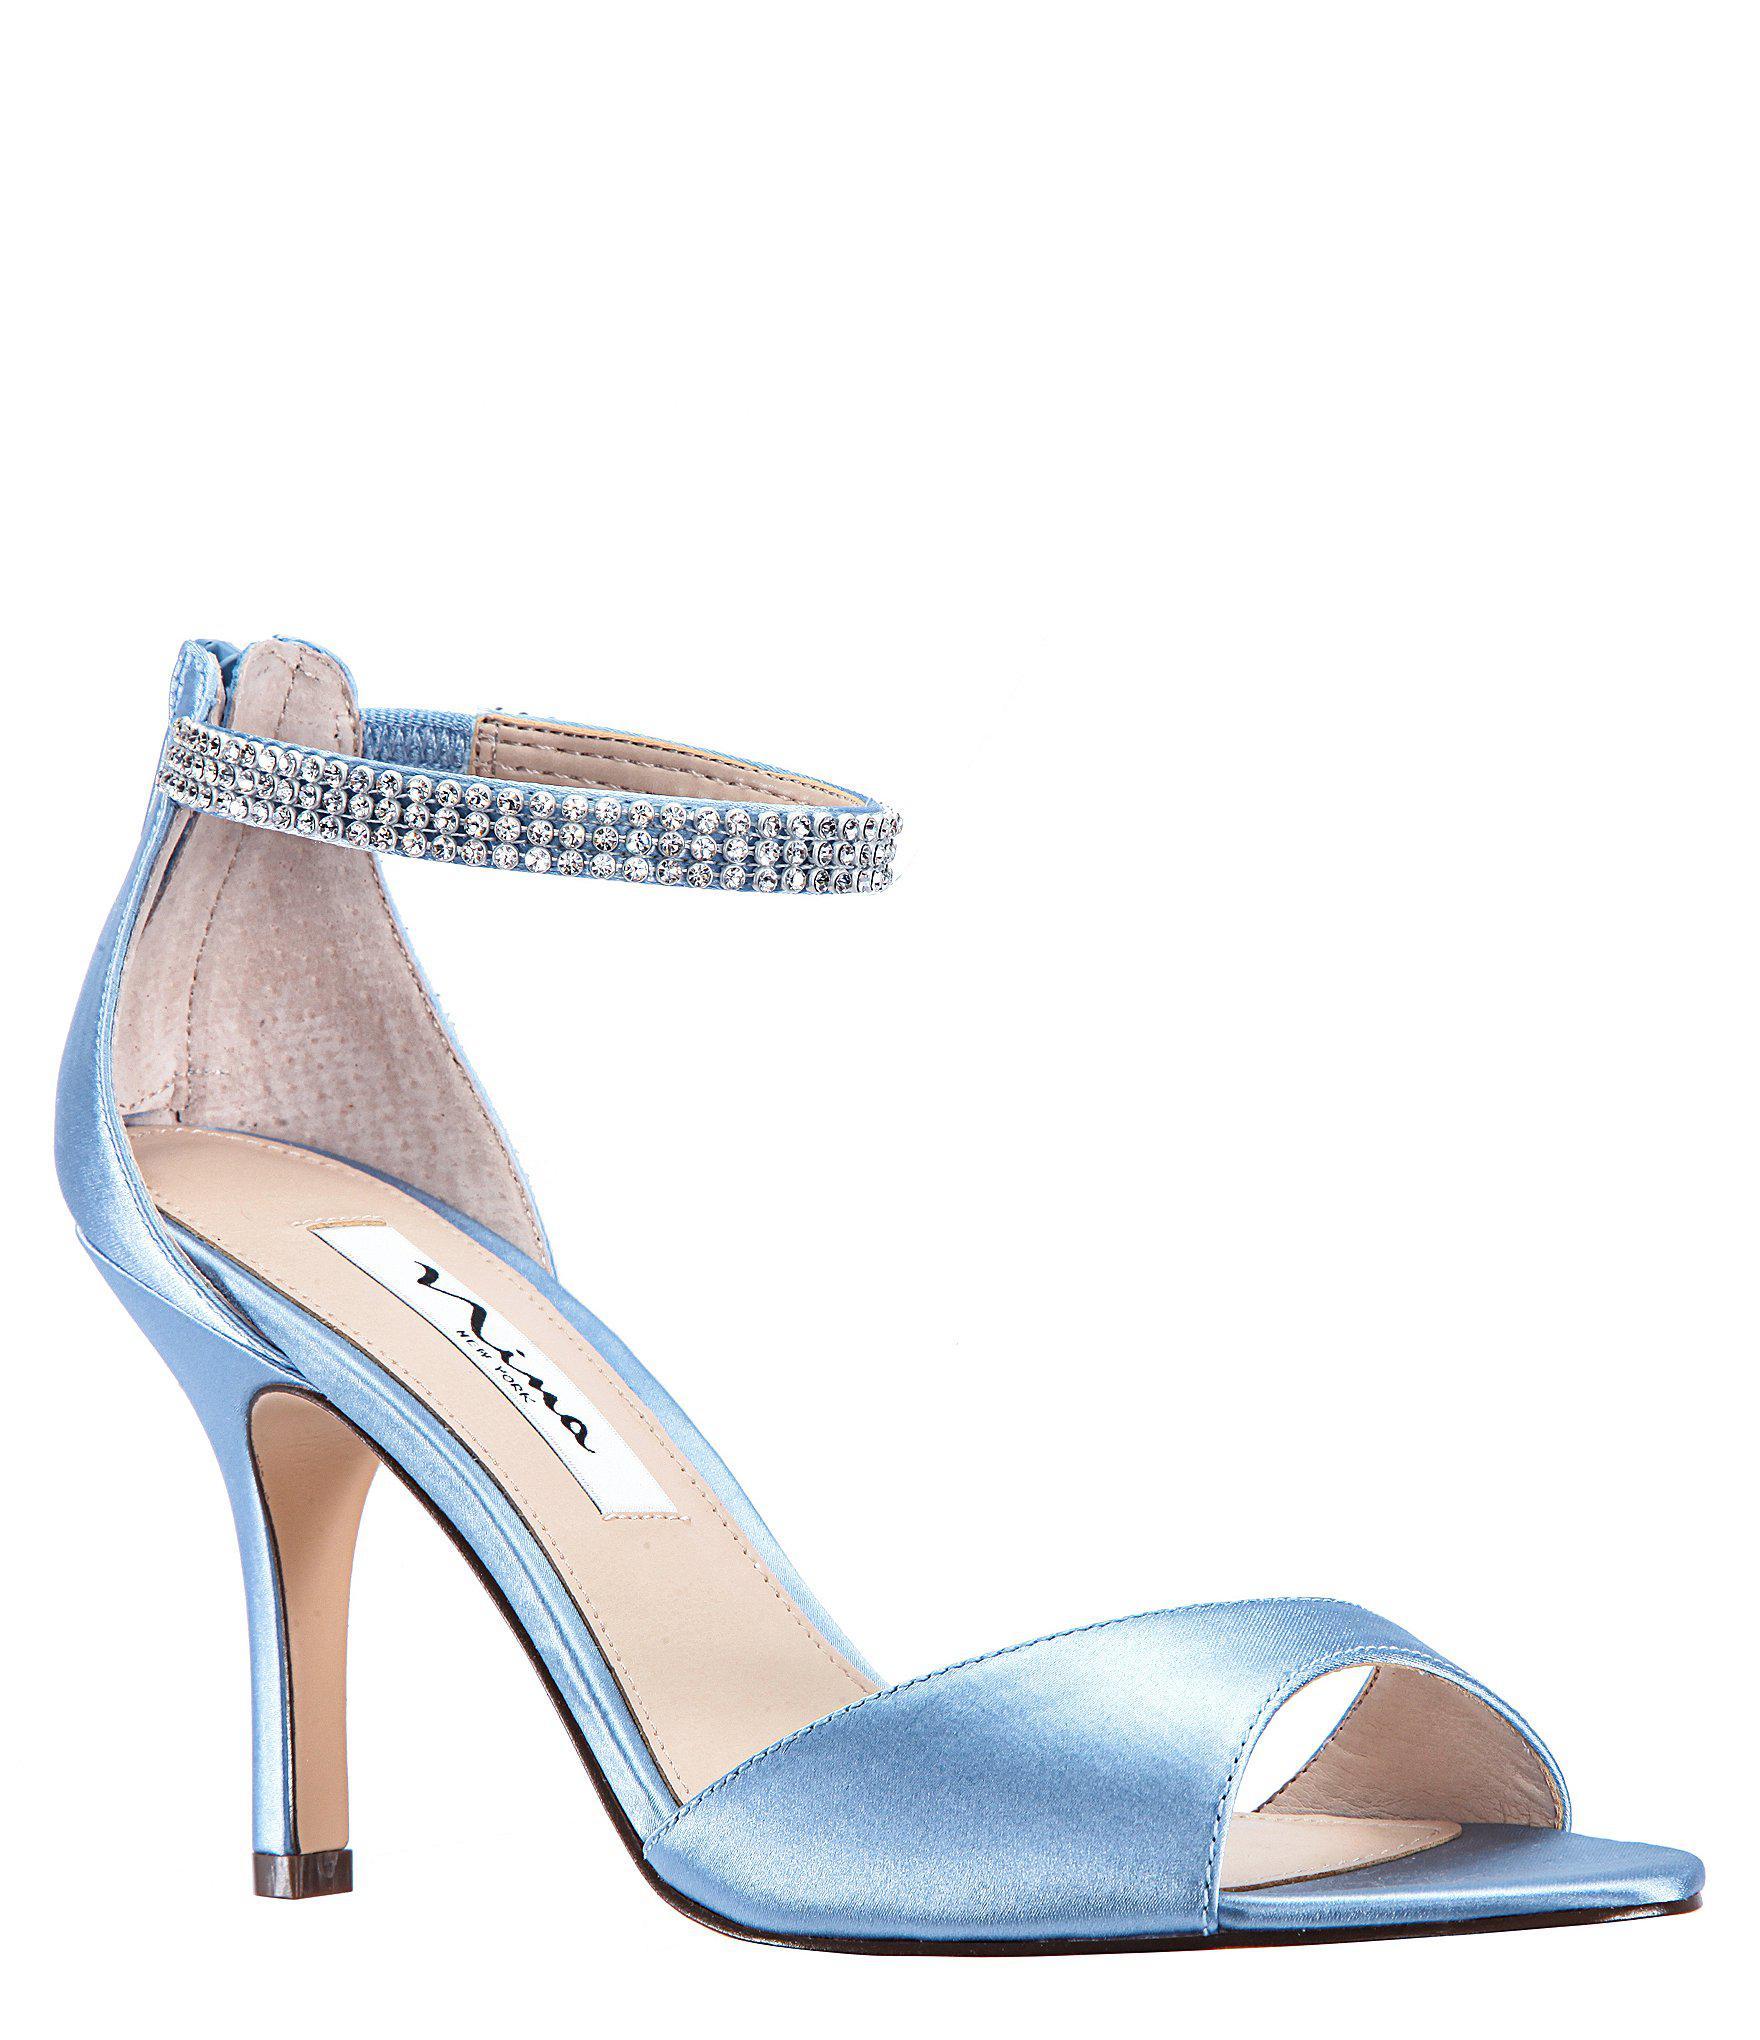 1246f9883 Lyst - Nina Volanda Satin And Rhinestone Dress Sandals in Blue ...